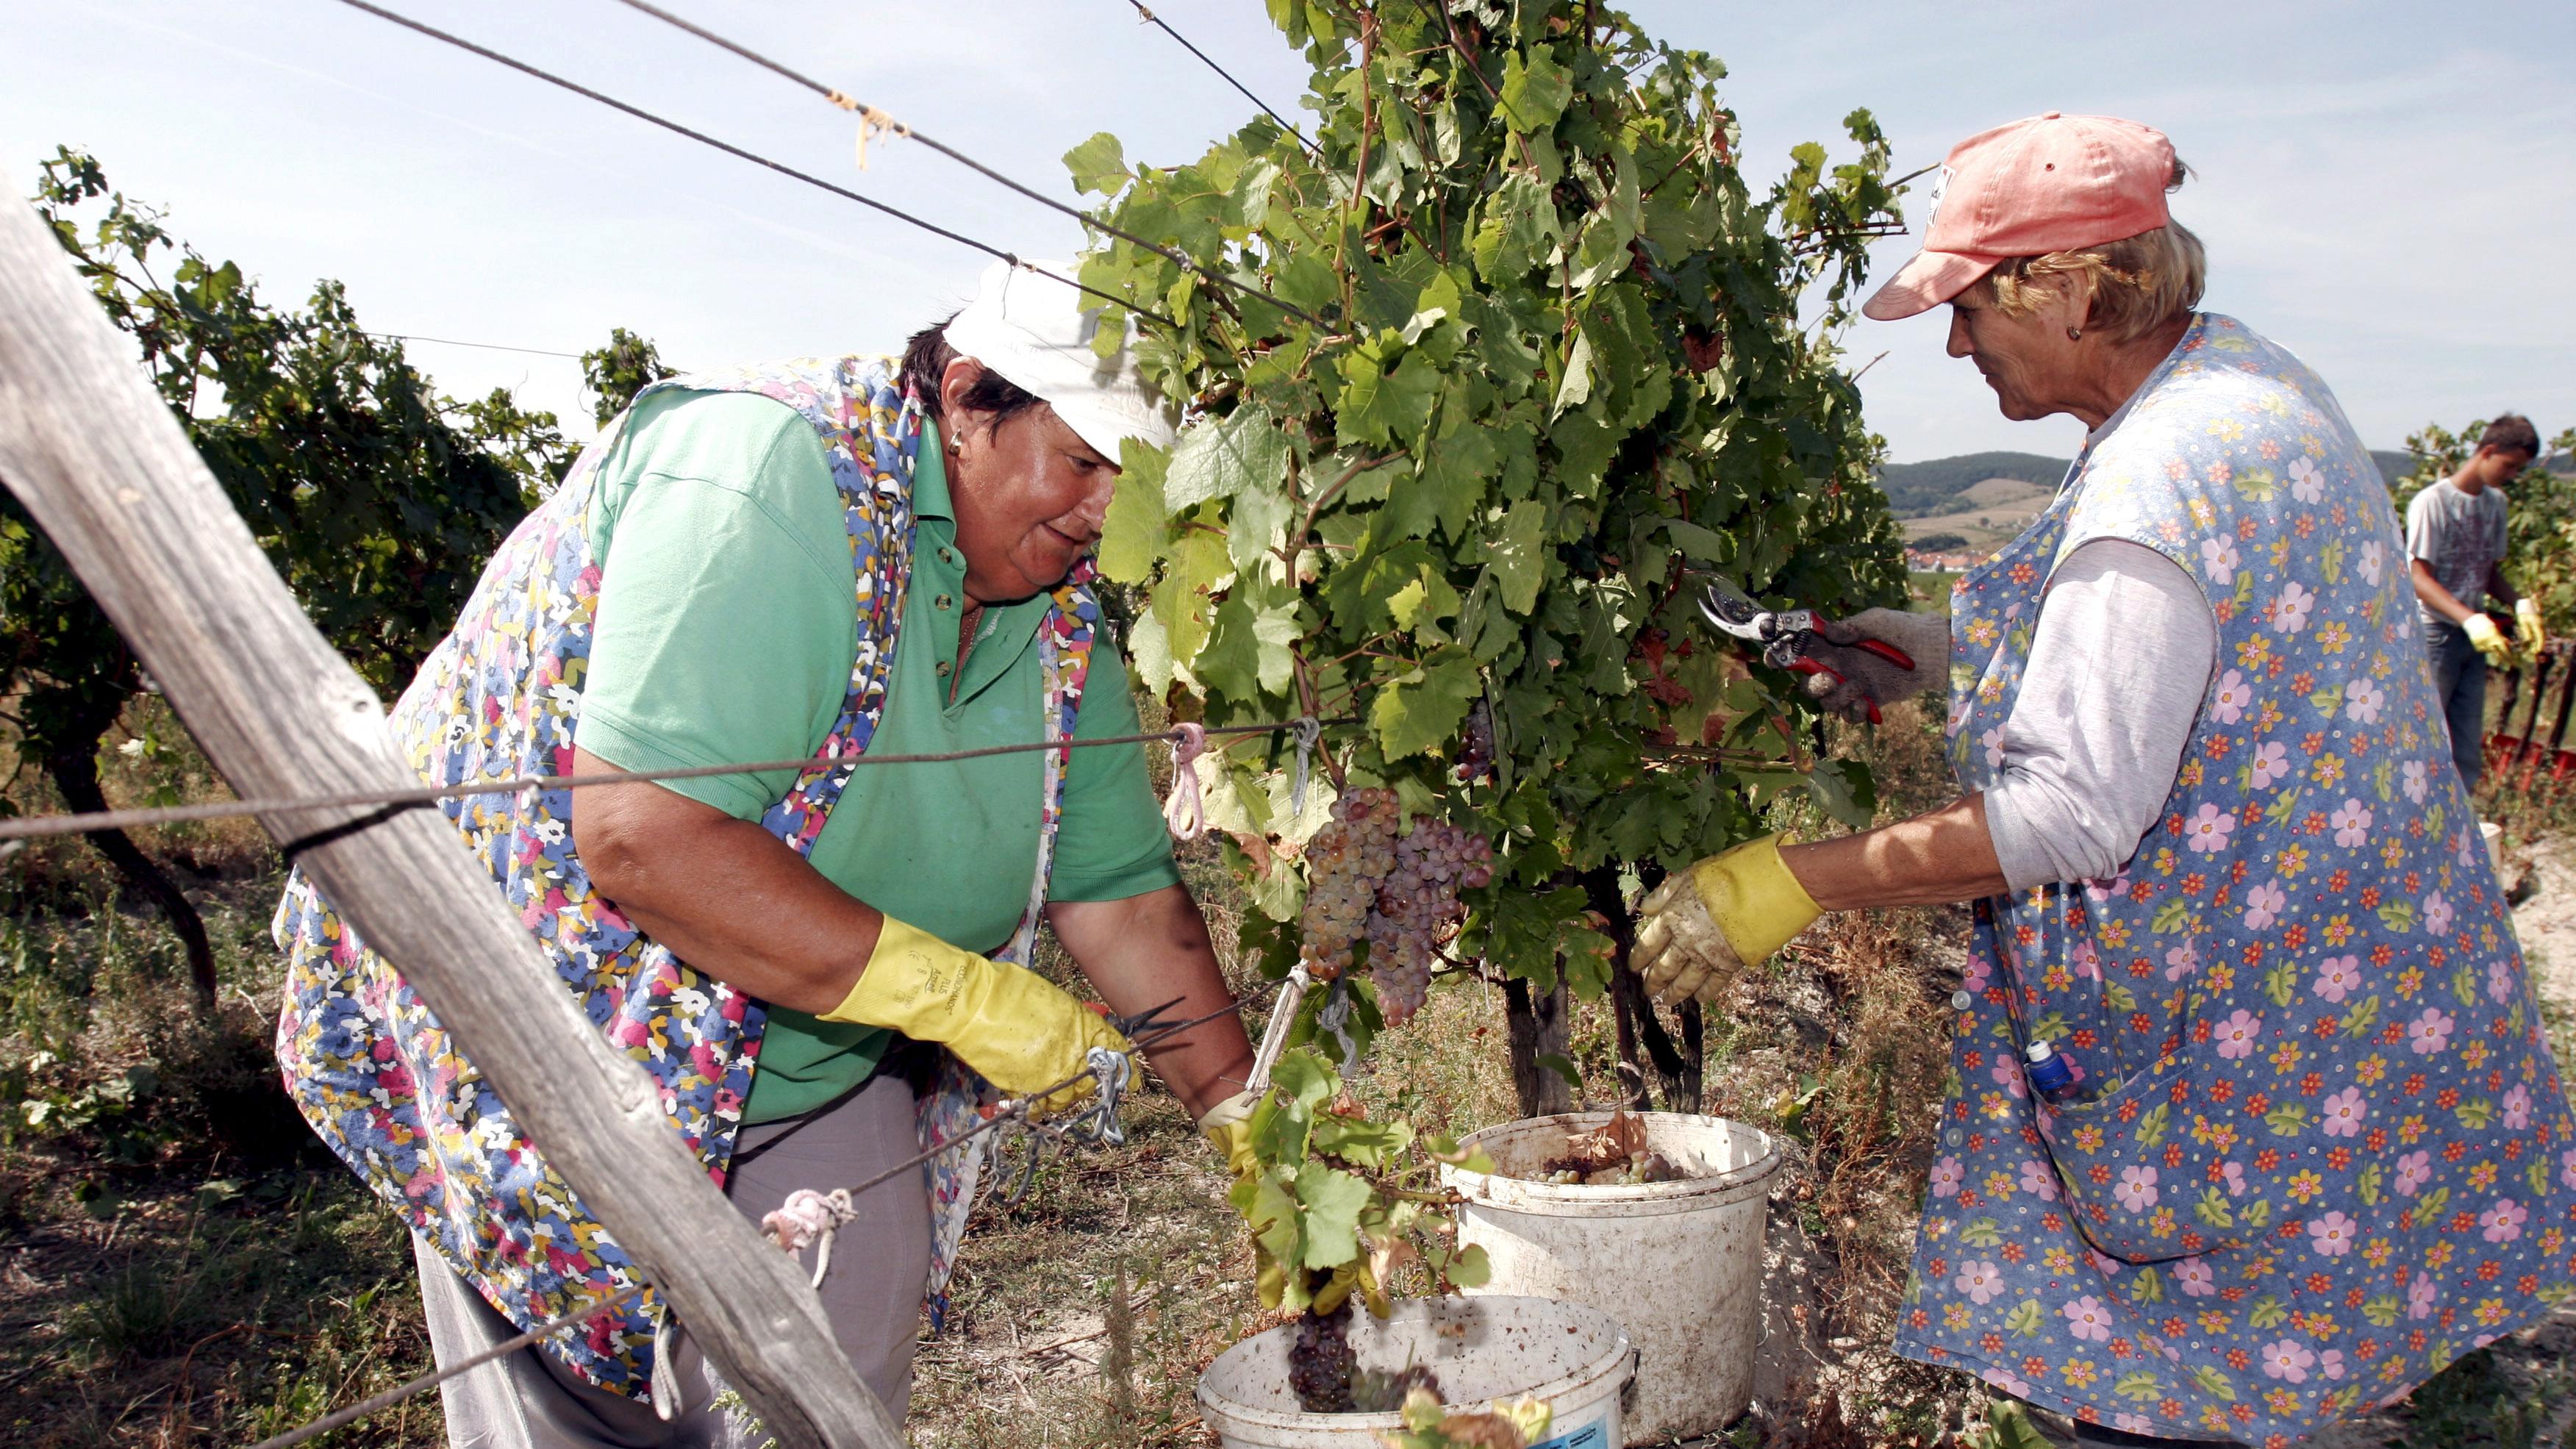 Harvesting grapes in the Small Carpathians near Bratislava, Slovakia